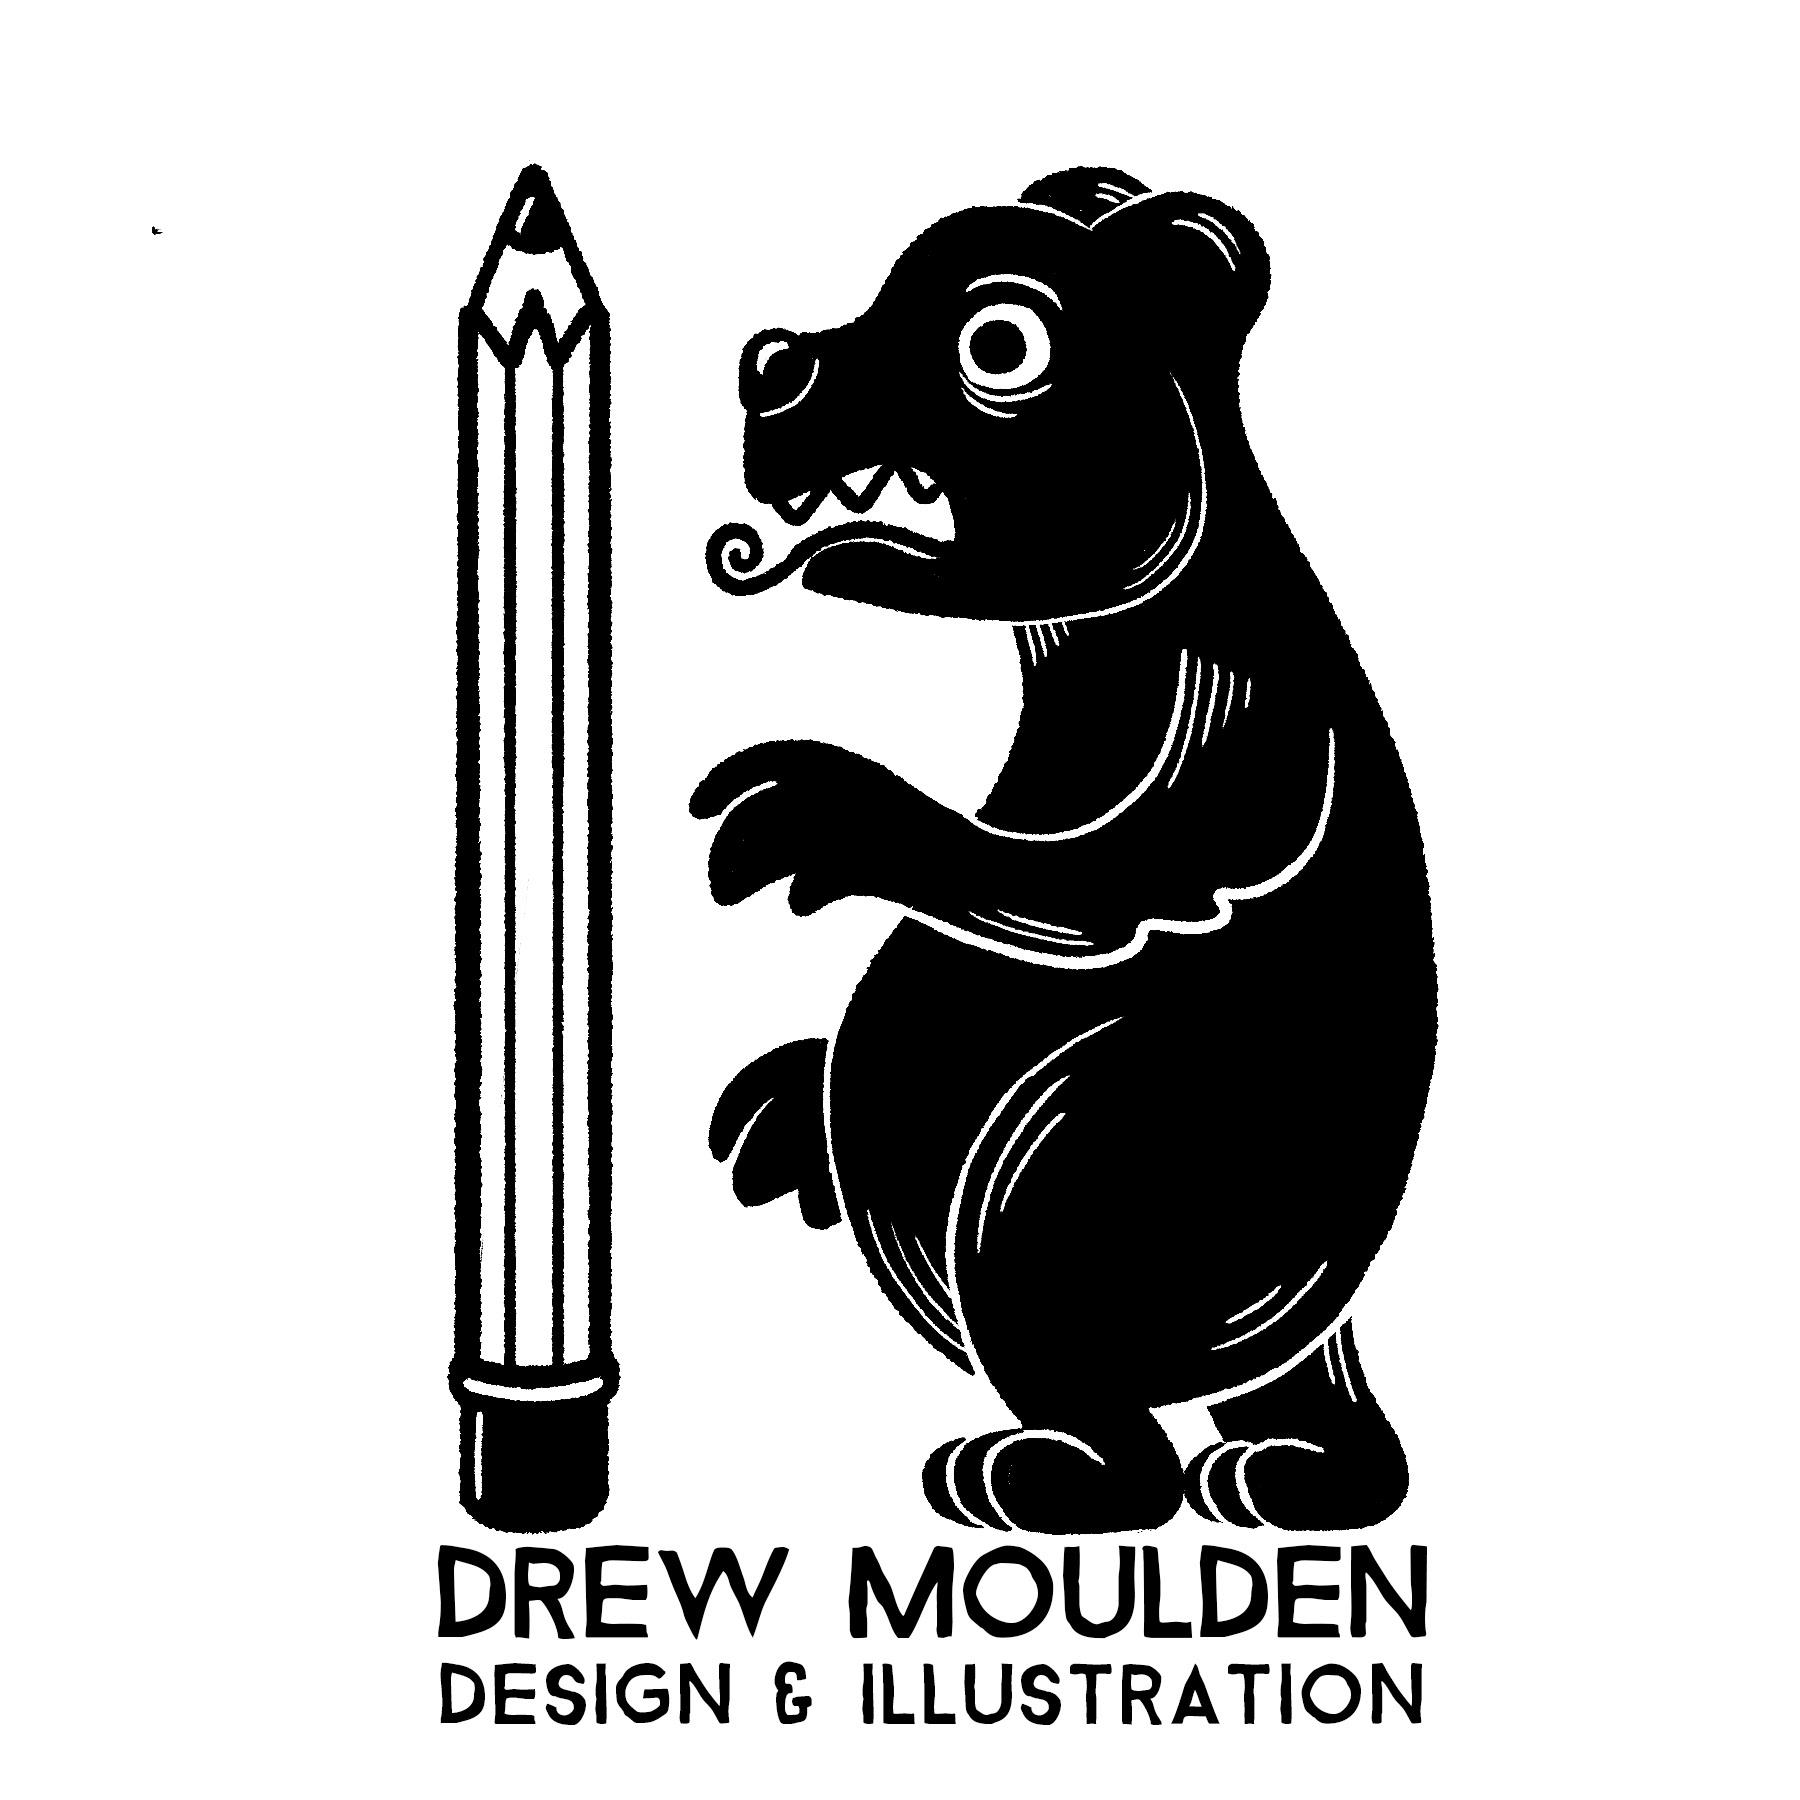 Andrew Moulden